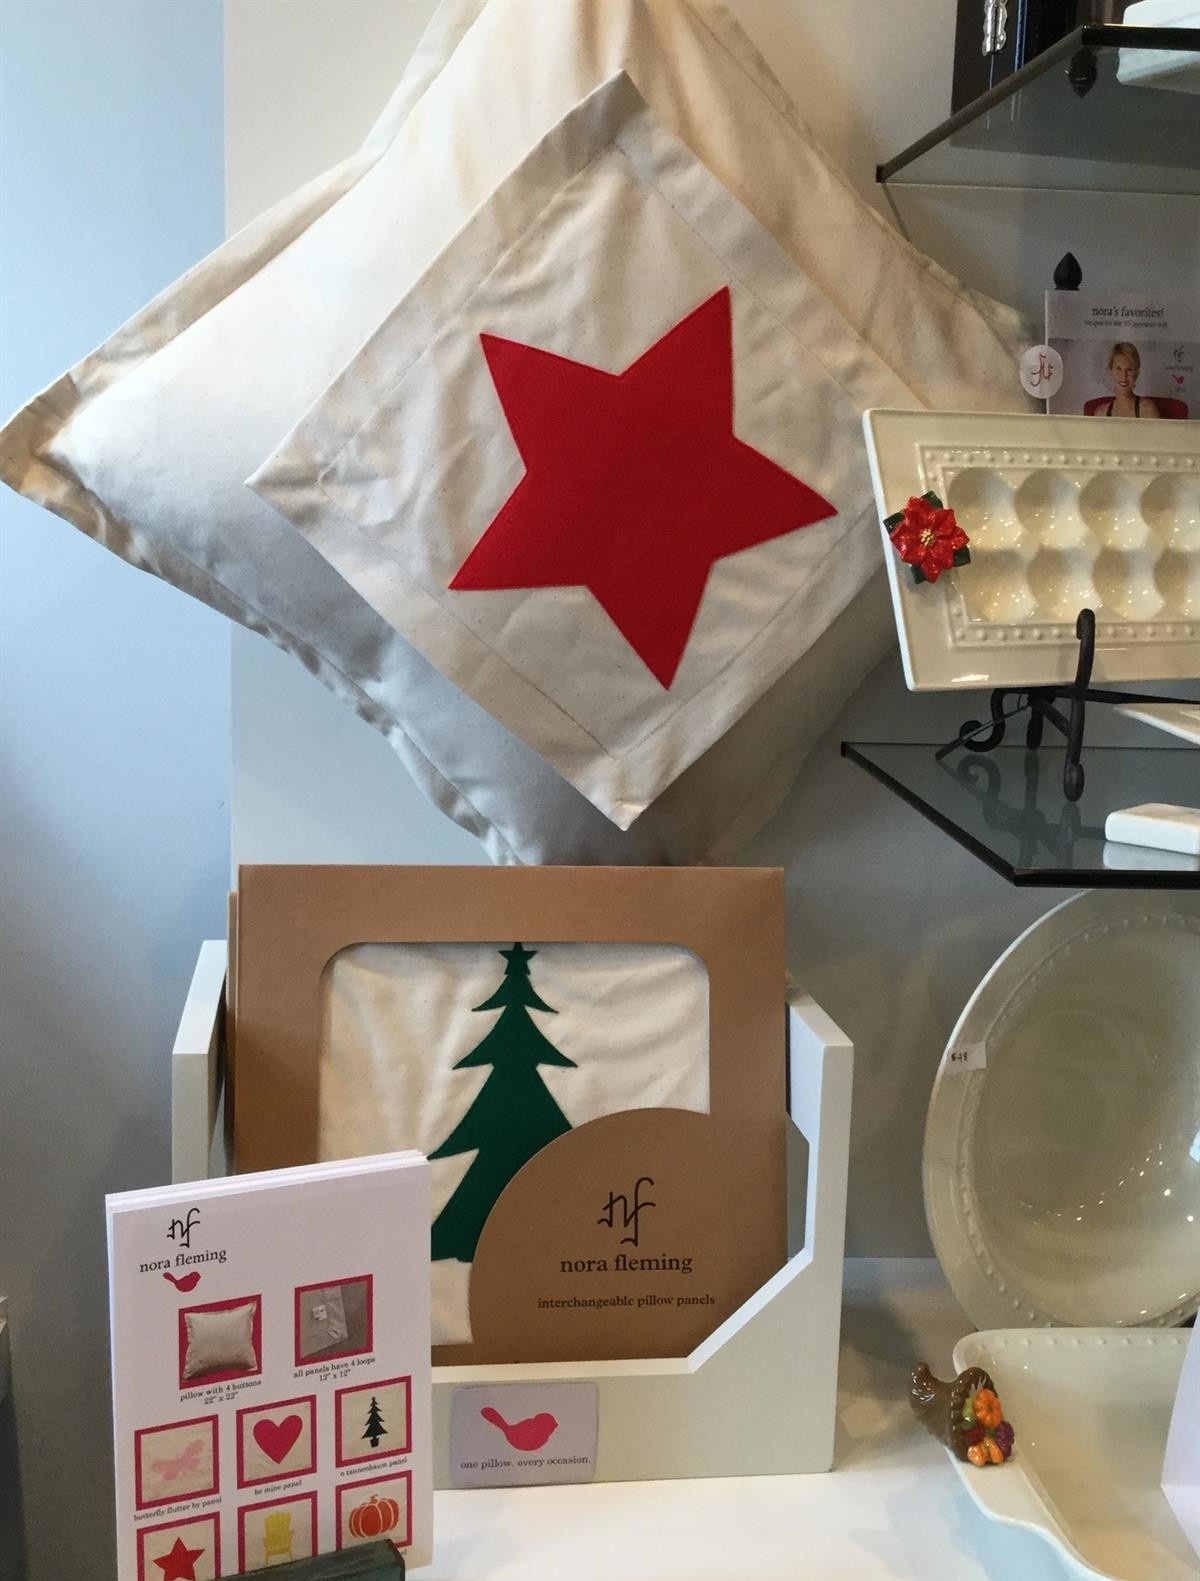 Nora_Fleming_Pillows_Toppers_Pumpkin_Christmas_Tree_Star